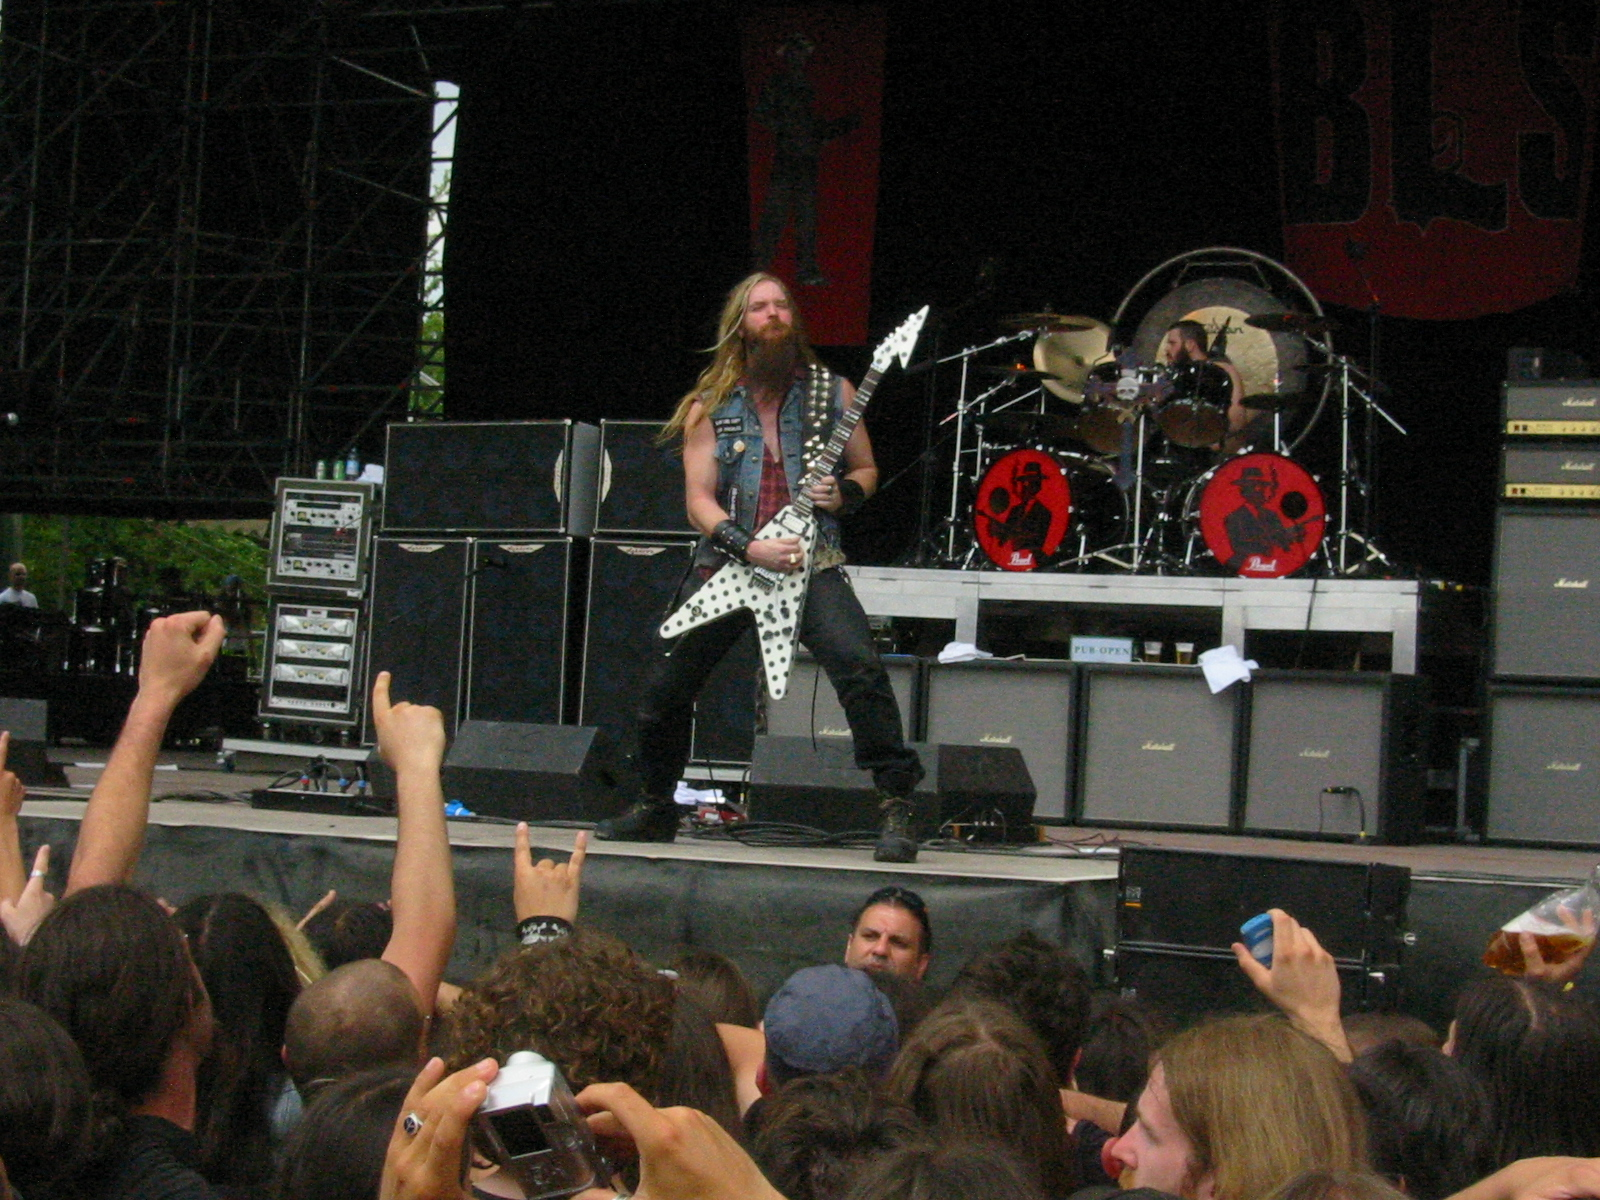 Descrizione zakk wylde summer bologna 2005 gods of metal